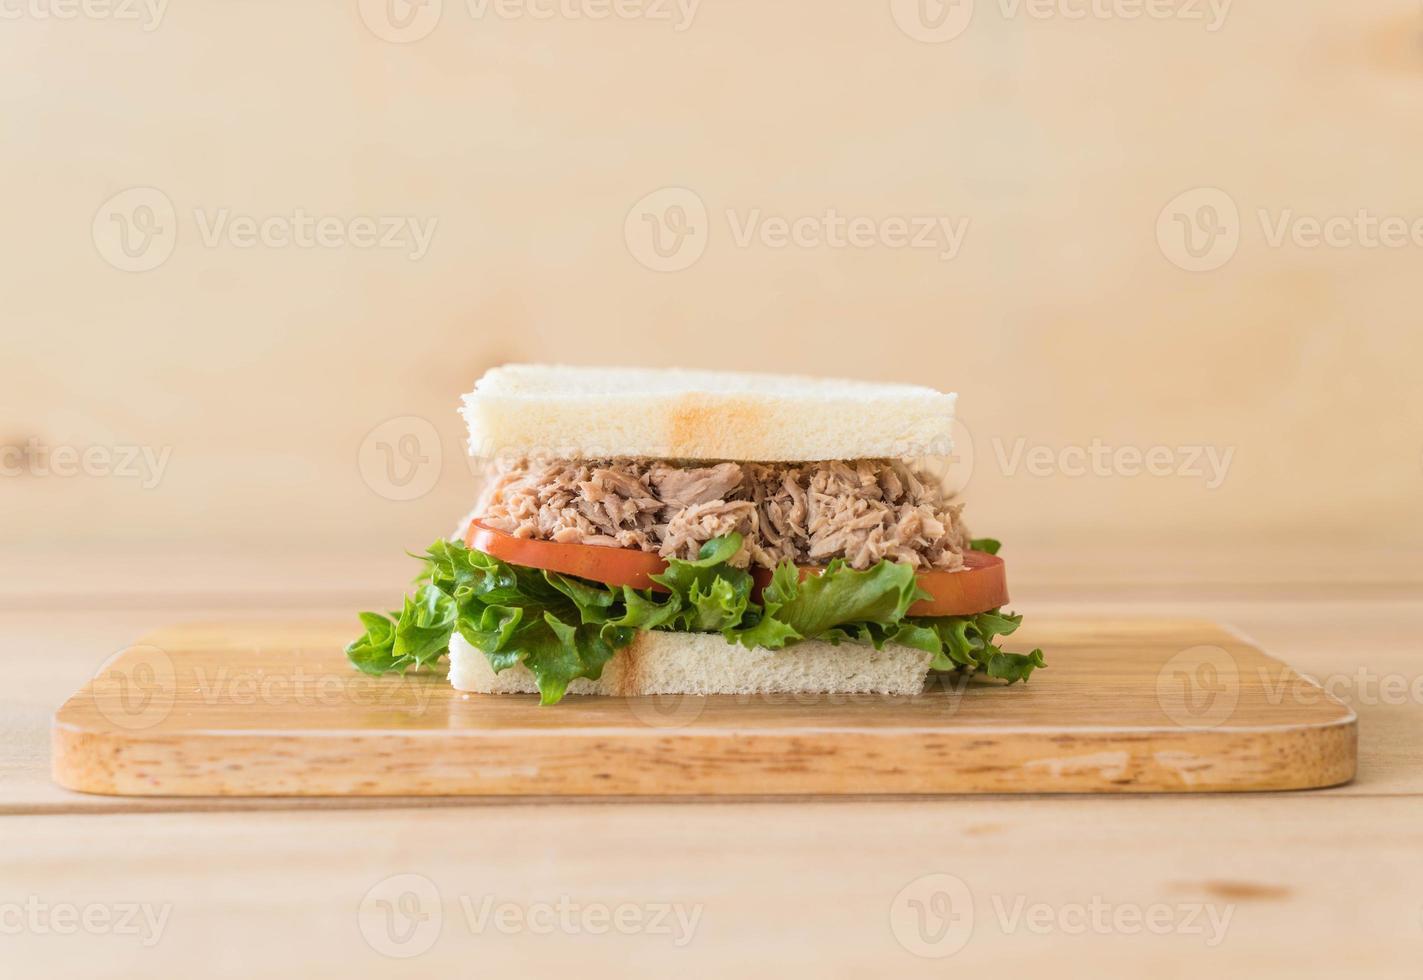 Tuna sandwich on wood board photo